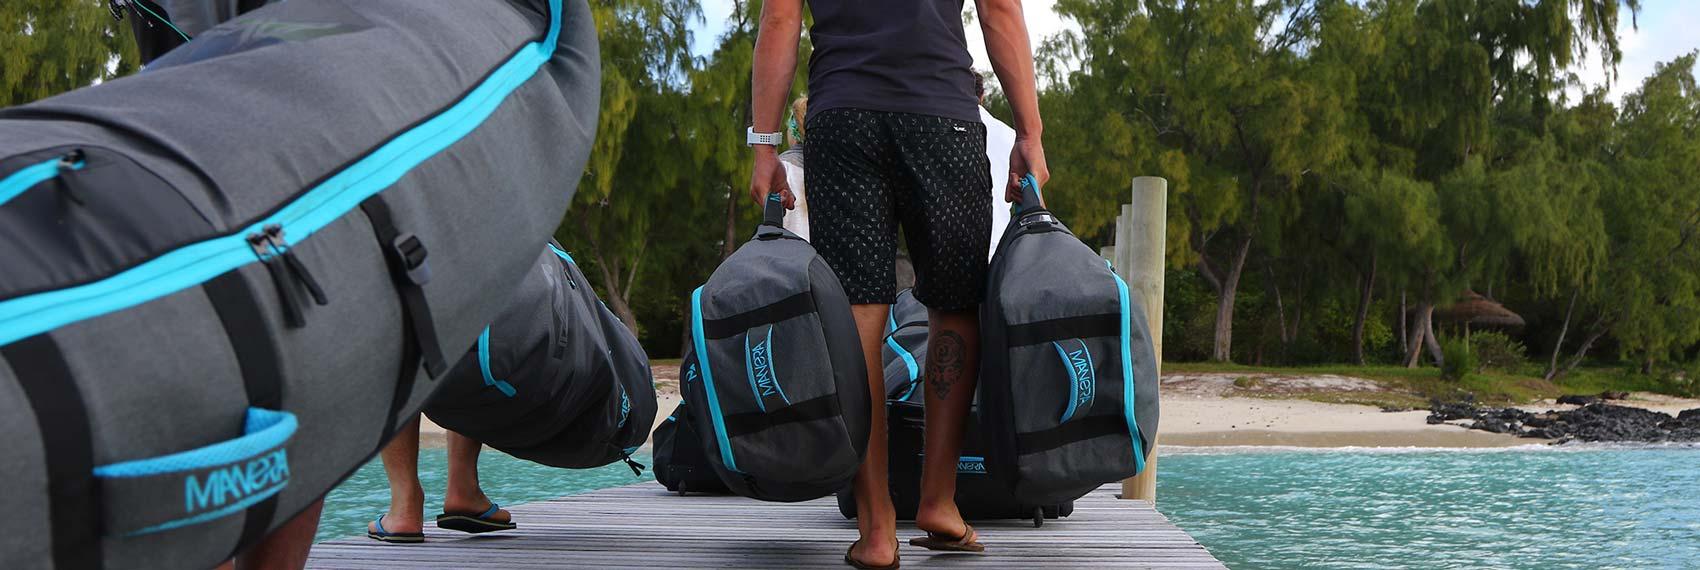 boardbags-banner